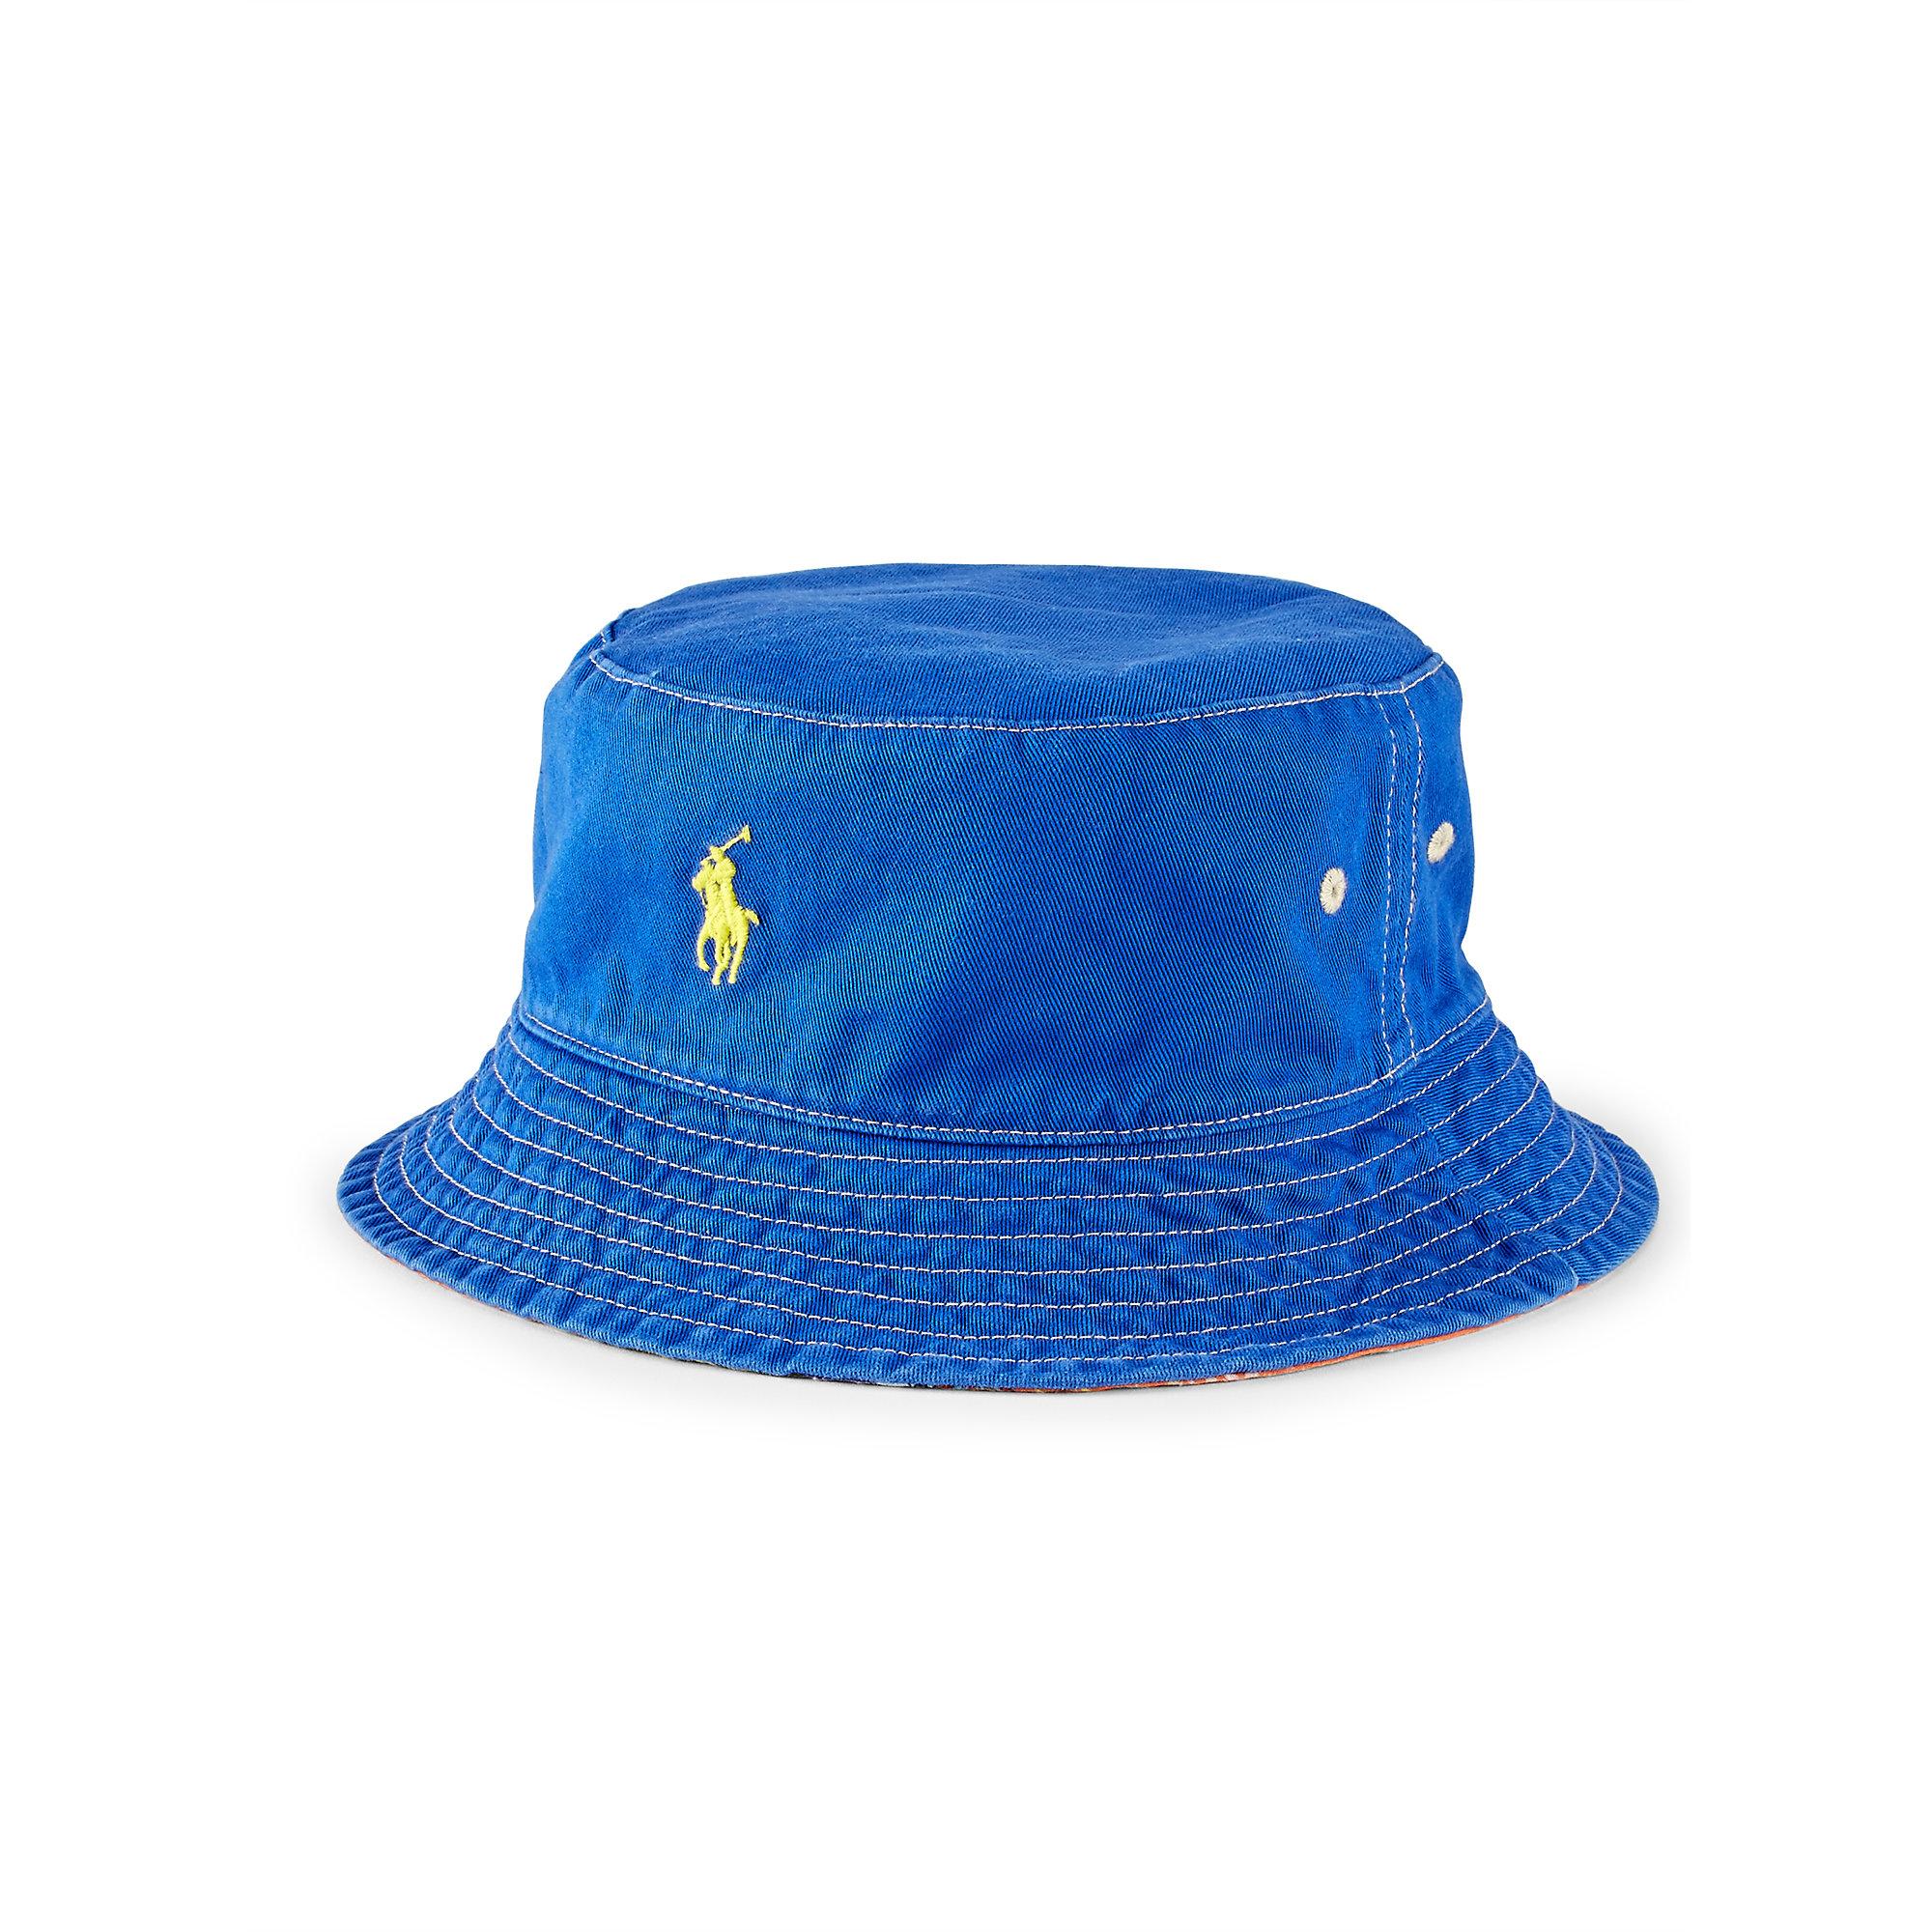 ffcd03aeb7832 Polo Ralph Lauren Reversible Twill Bucket Hat in Blue - Lyst